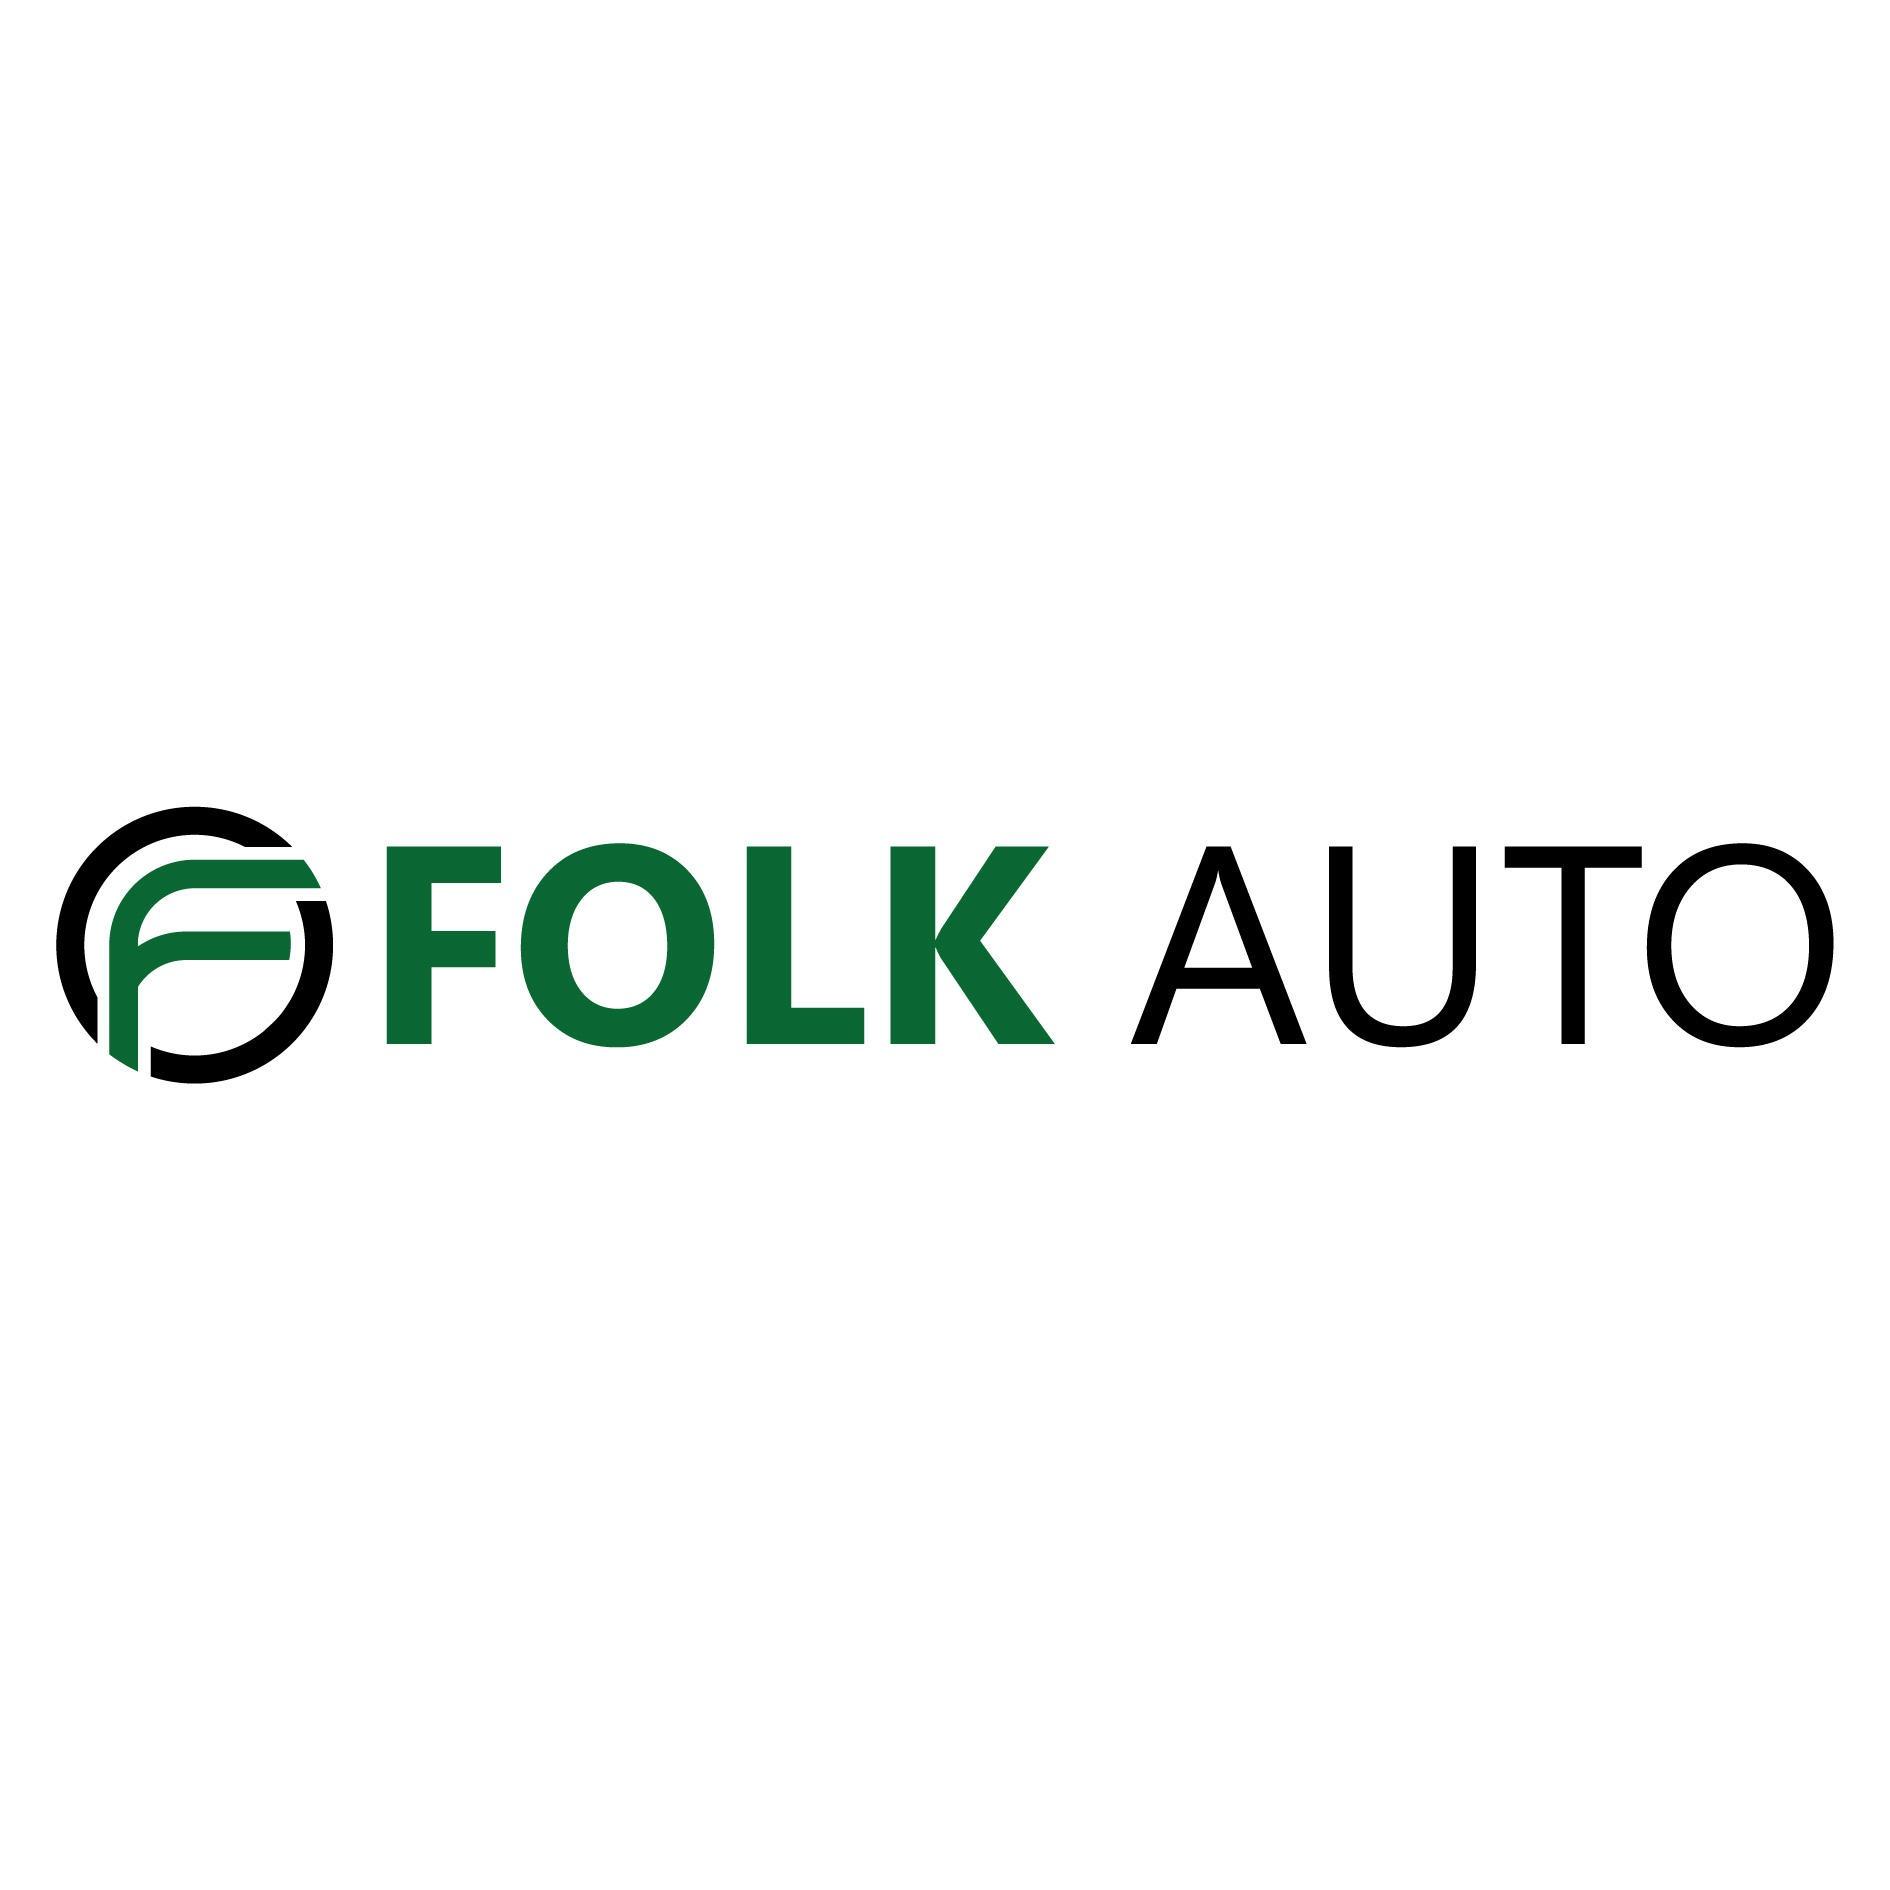 Škoda Viljandi - Folk Auto (Folk Auto OÜ)